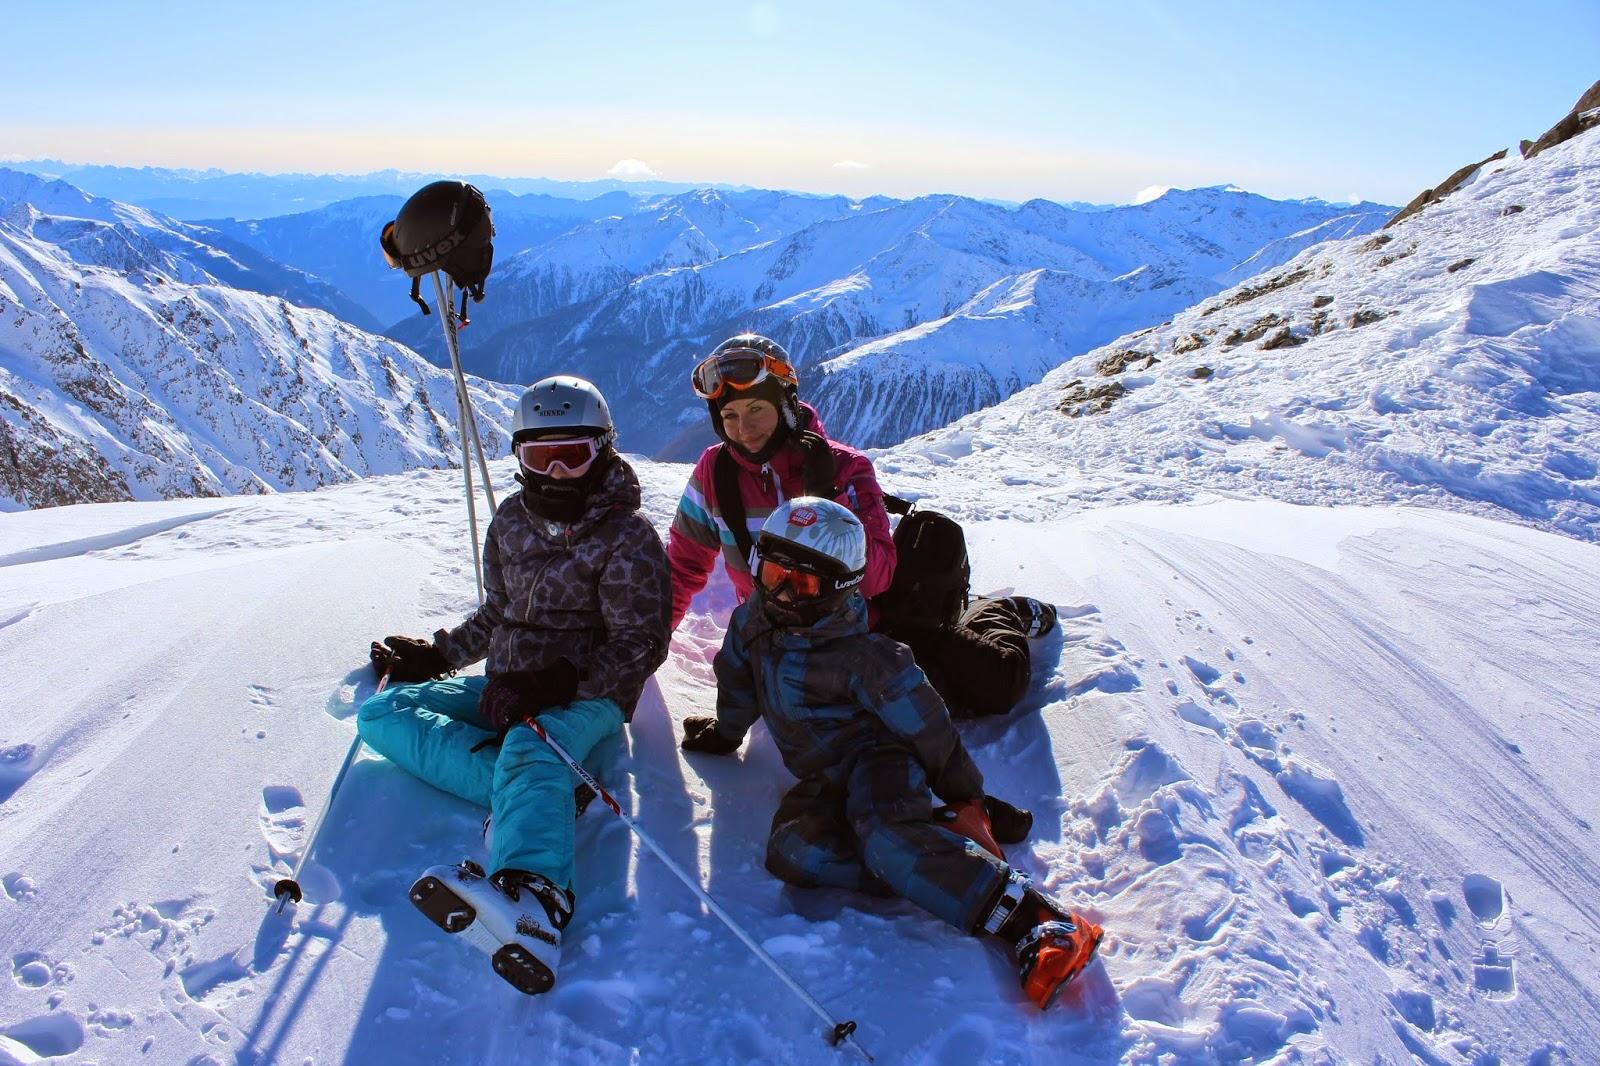 family style, ski style, inspirations ski fashion, szczyt widok góry, mountain